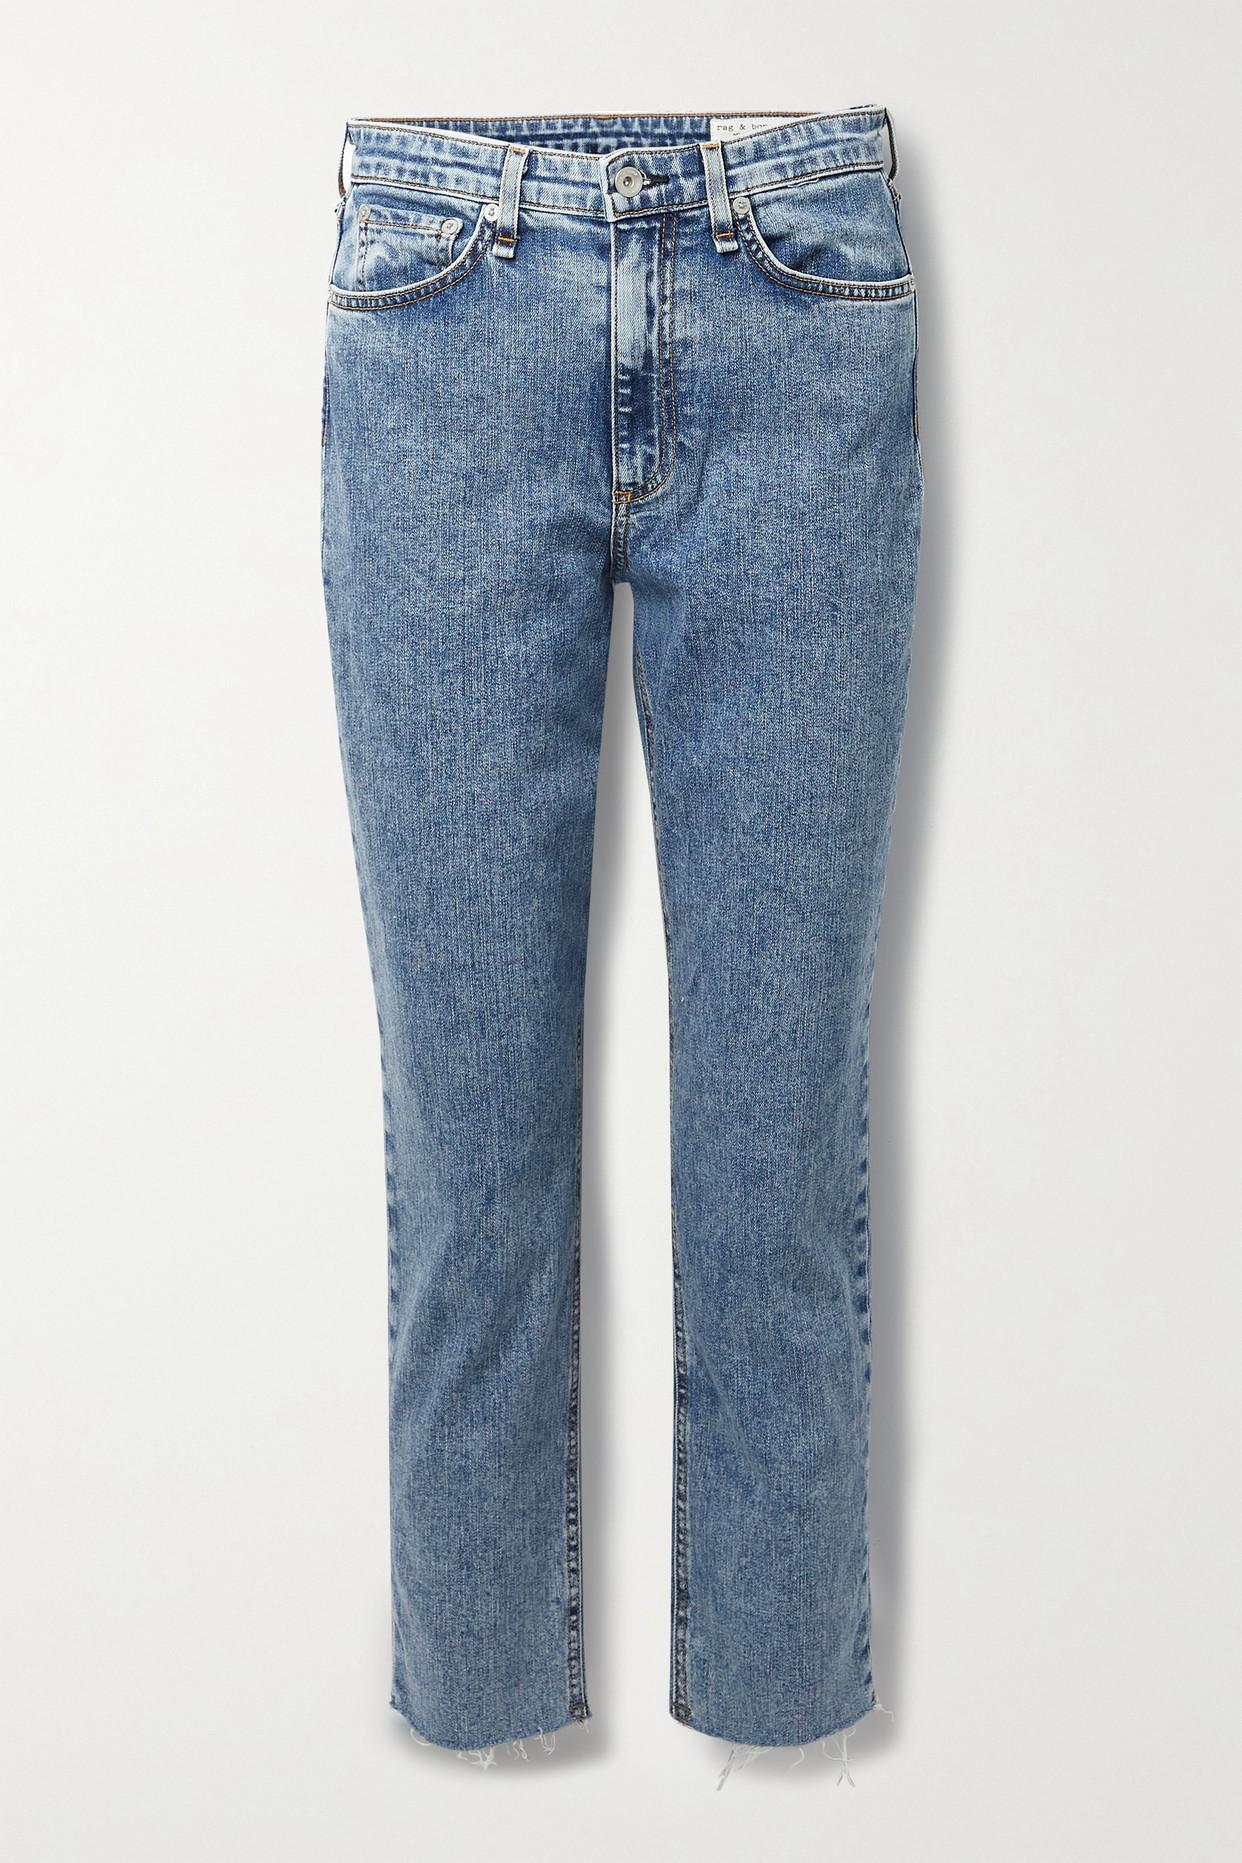 RAG & BONE - Nina Distressed Acid-wash High-rise Straight-leg Jeans - Blue - 31